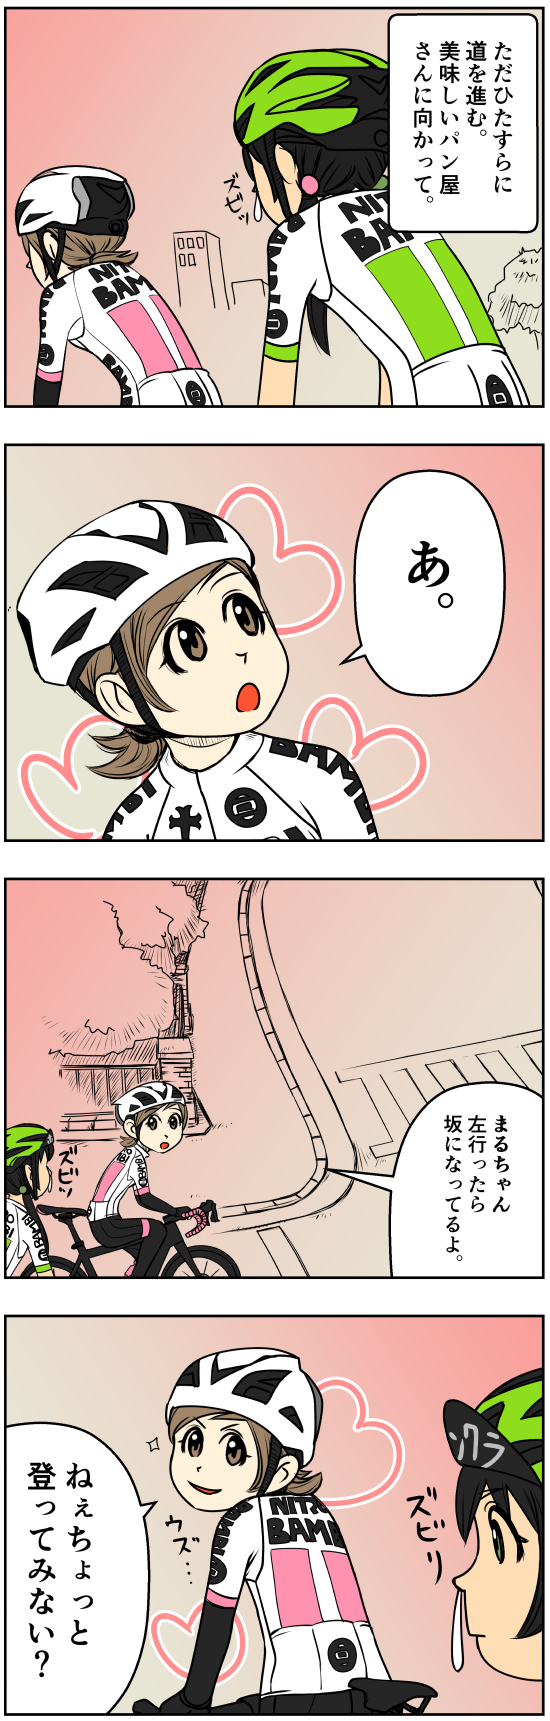 sansyokudanngochan-58-116.jpg